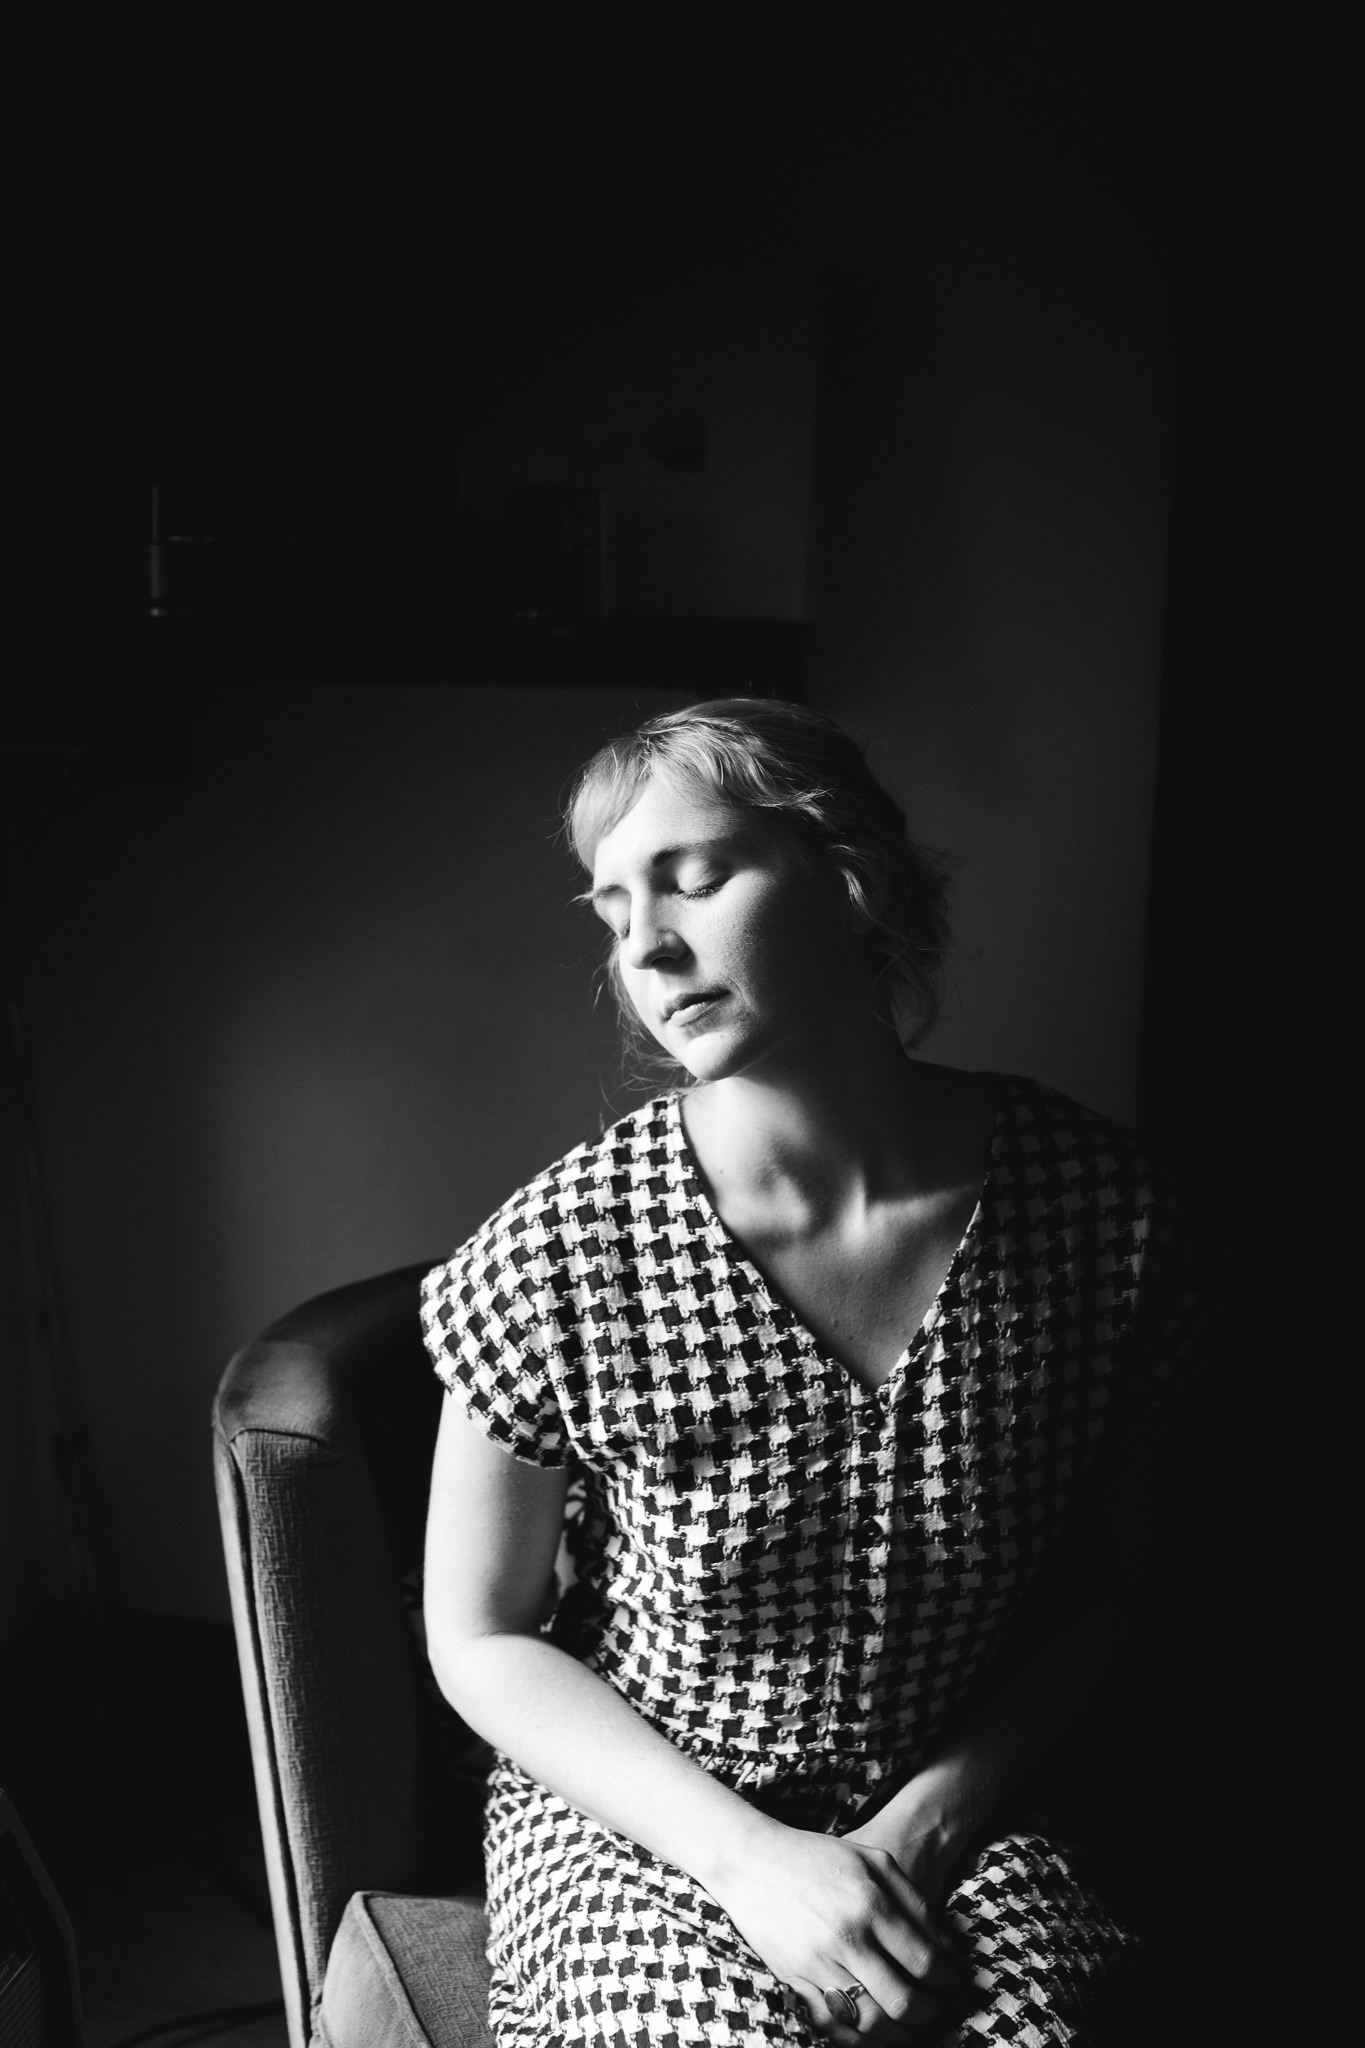 37-portraits-little-green-eyes-jessie-mccall-portland-melbourne.jpg